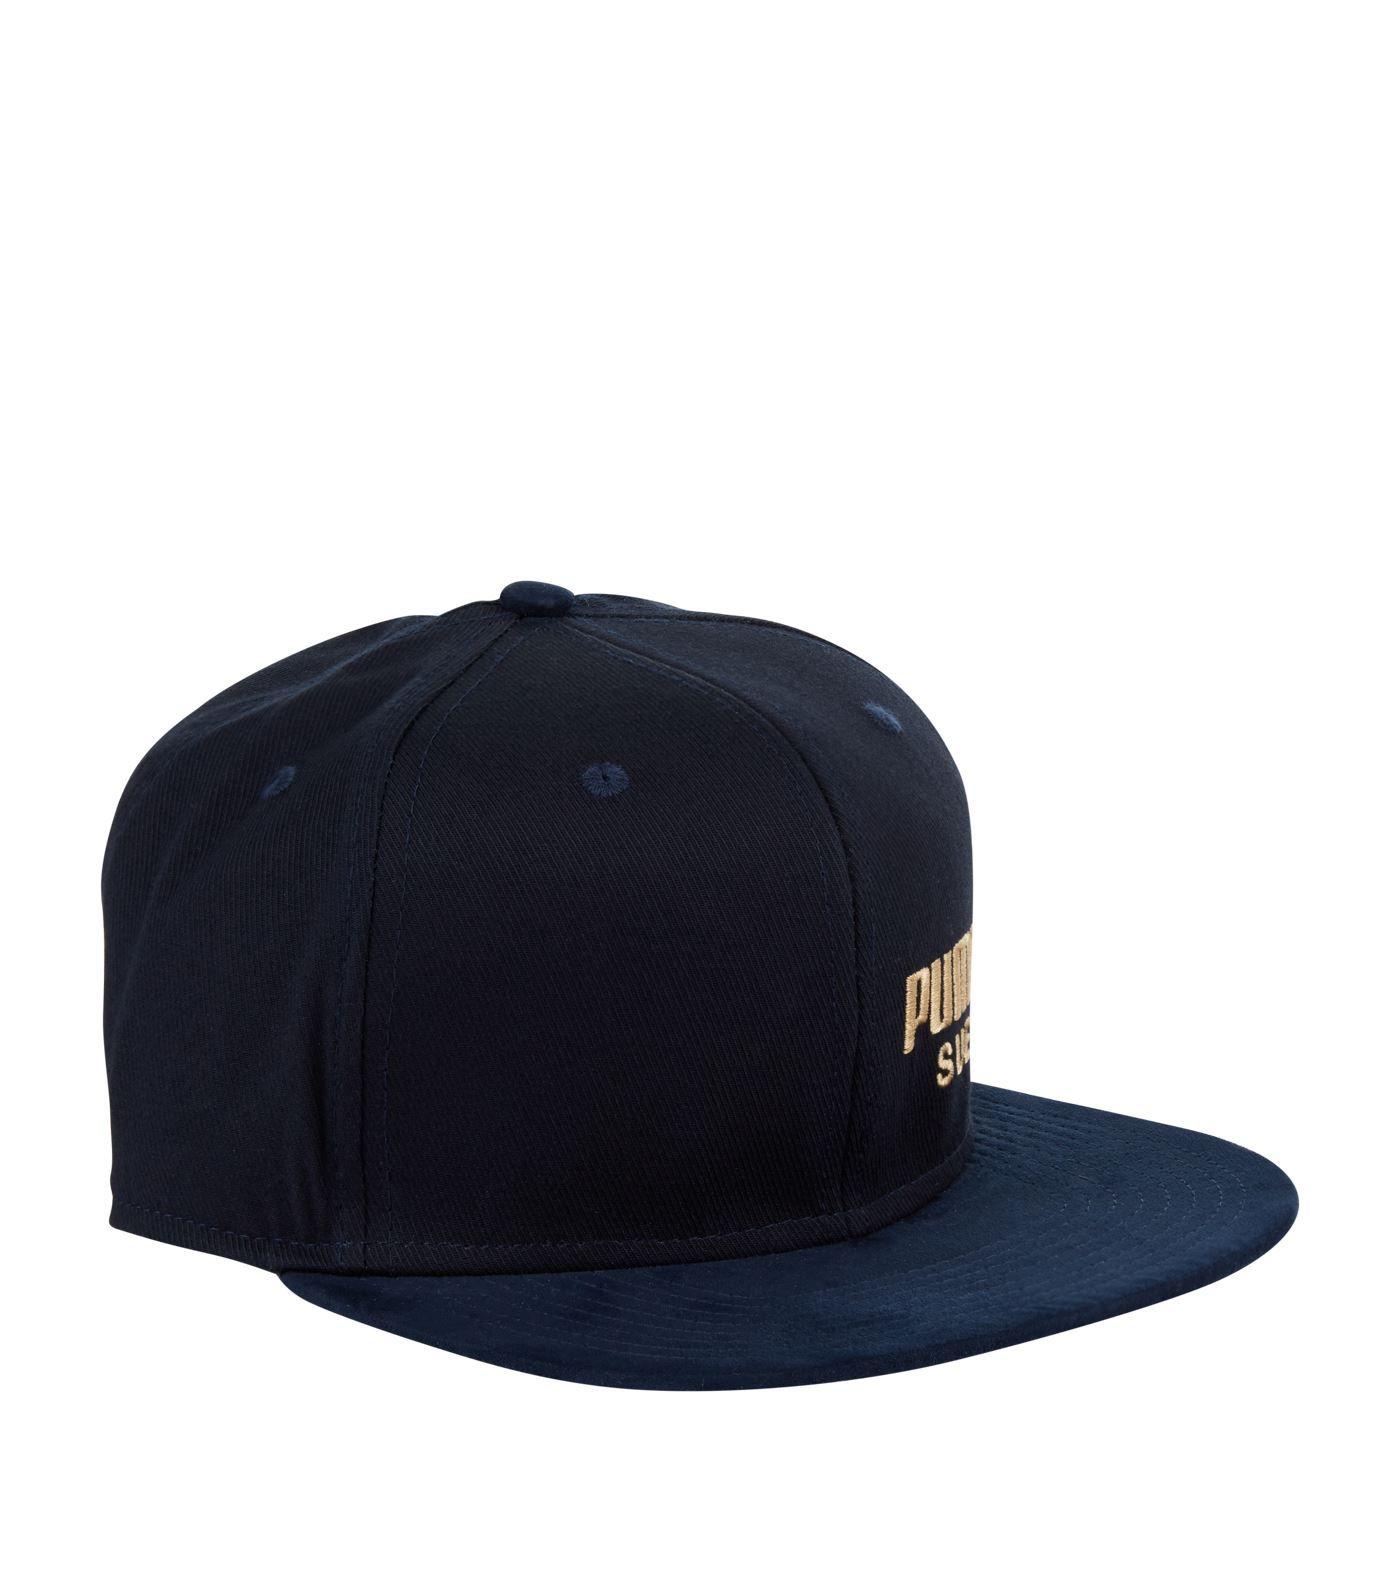 hot sale online 3417b 6840c PUMA ARCHIVE FAUX SUEDE CAP.  puma  cloth